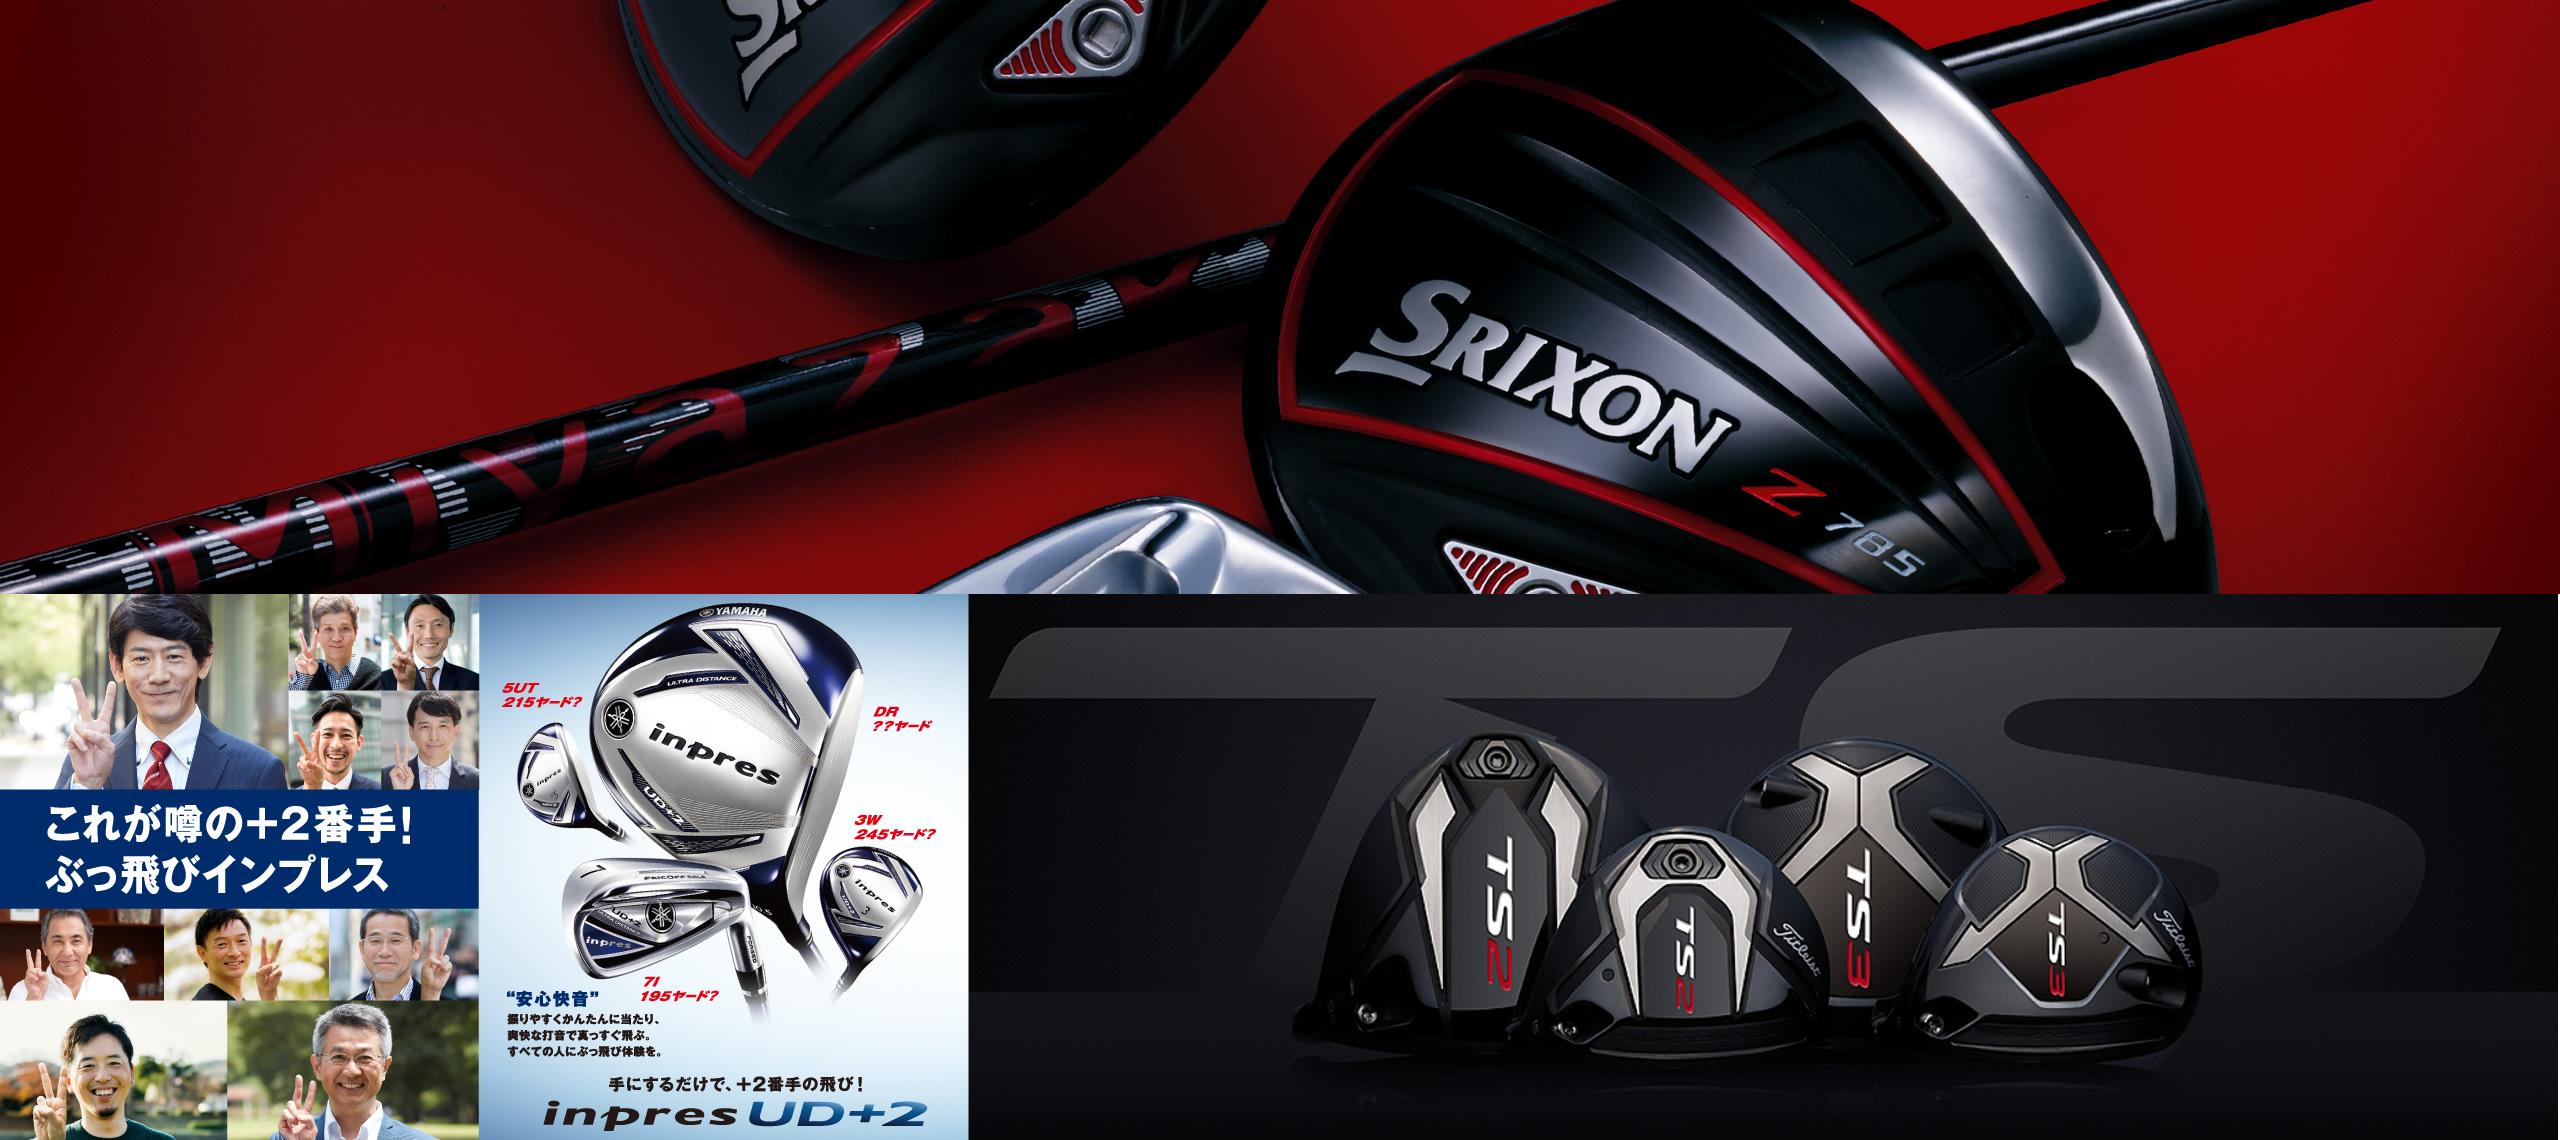 Dunlop SRIXON Z585/Z785 Titleist TS2/TS3